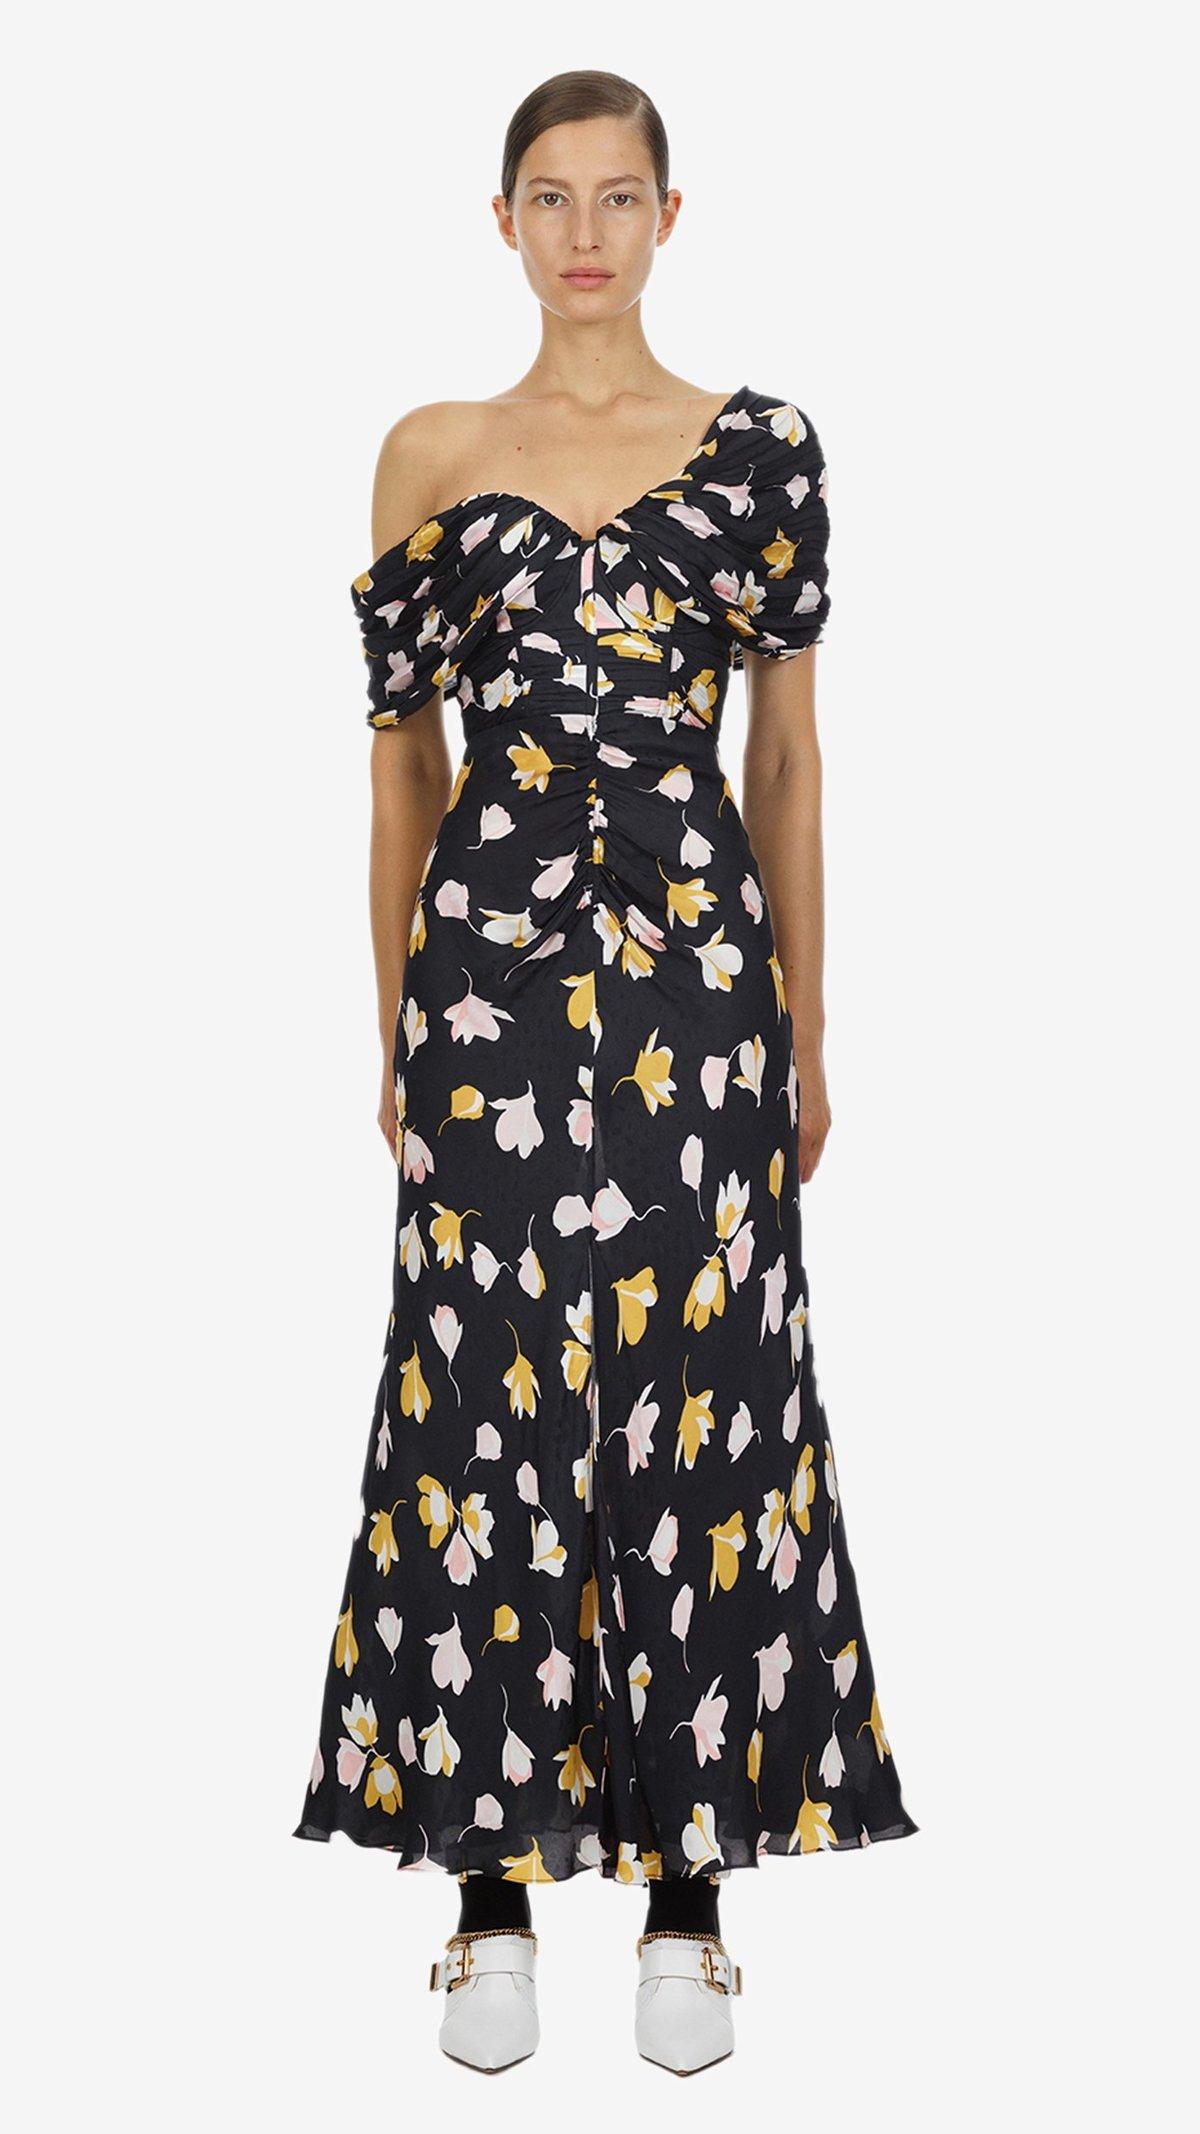 b91720383f3f Self-Portrait Off-Shoulder Dress - Floral Print   Garmentory